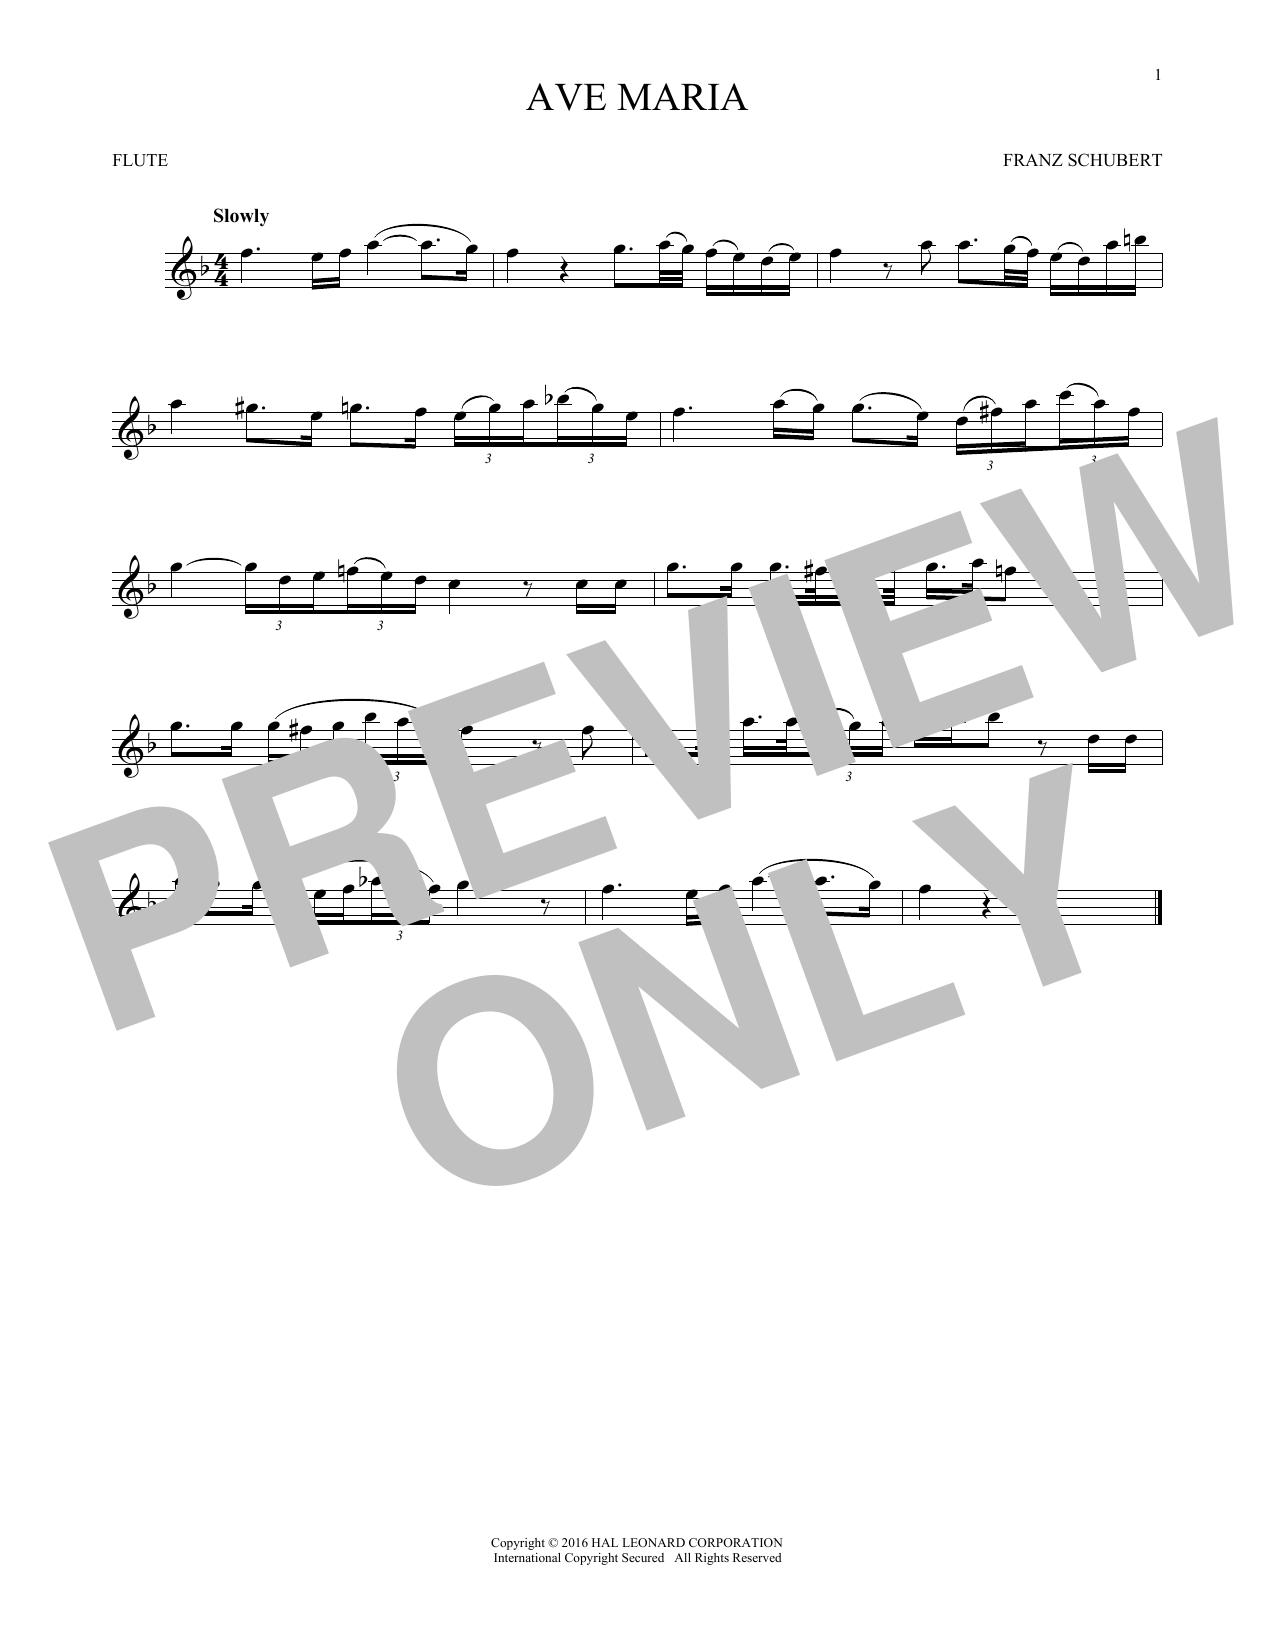 Ave Maria, Op. 52, No. 6 (Flute Solo)